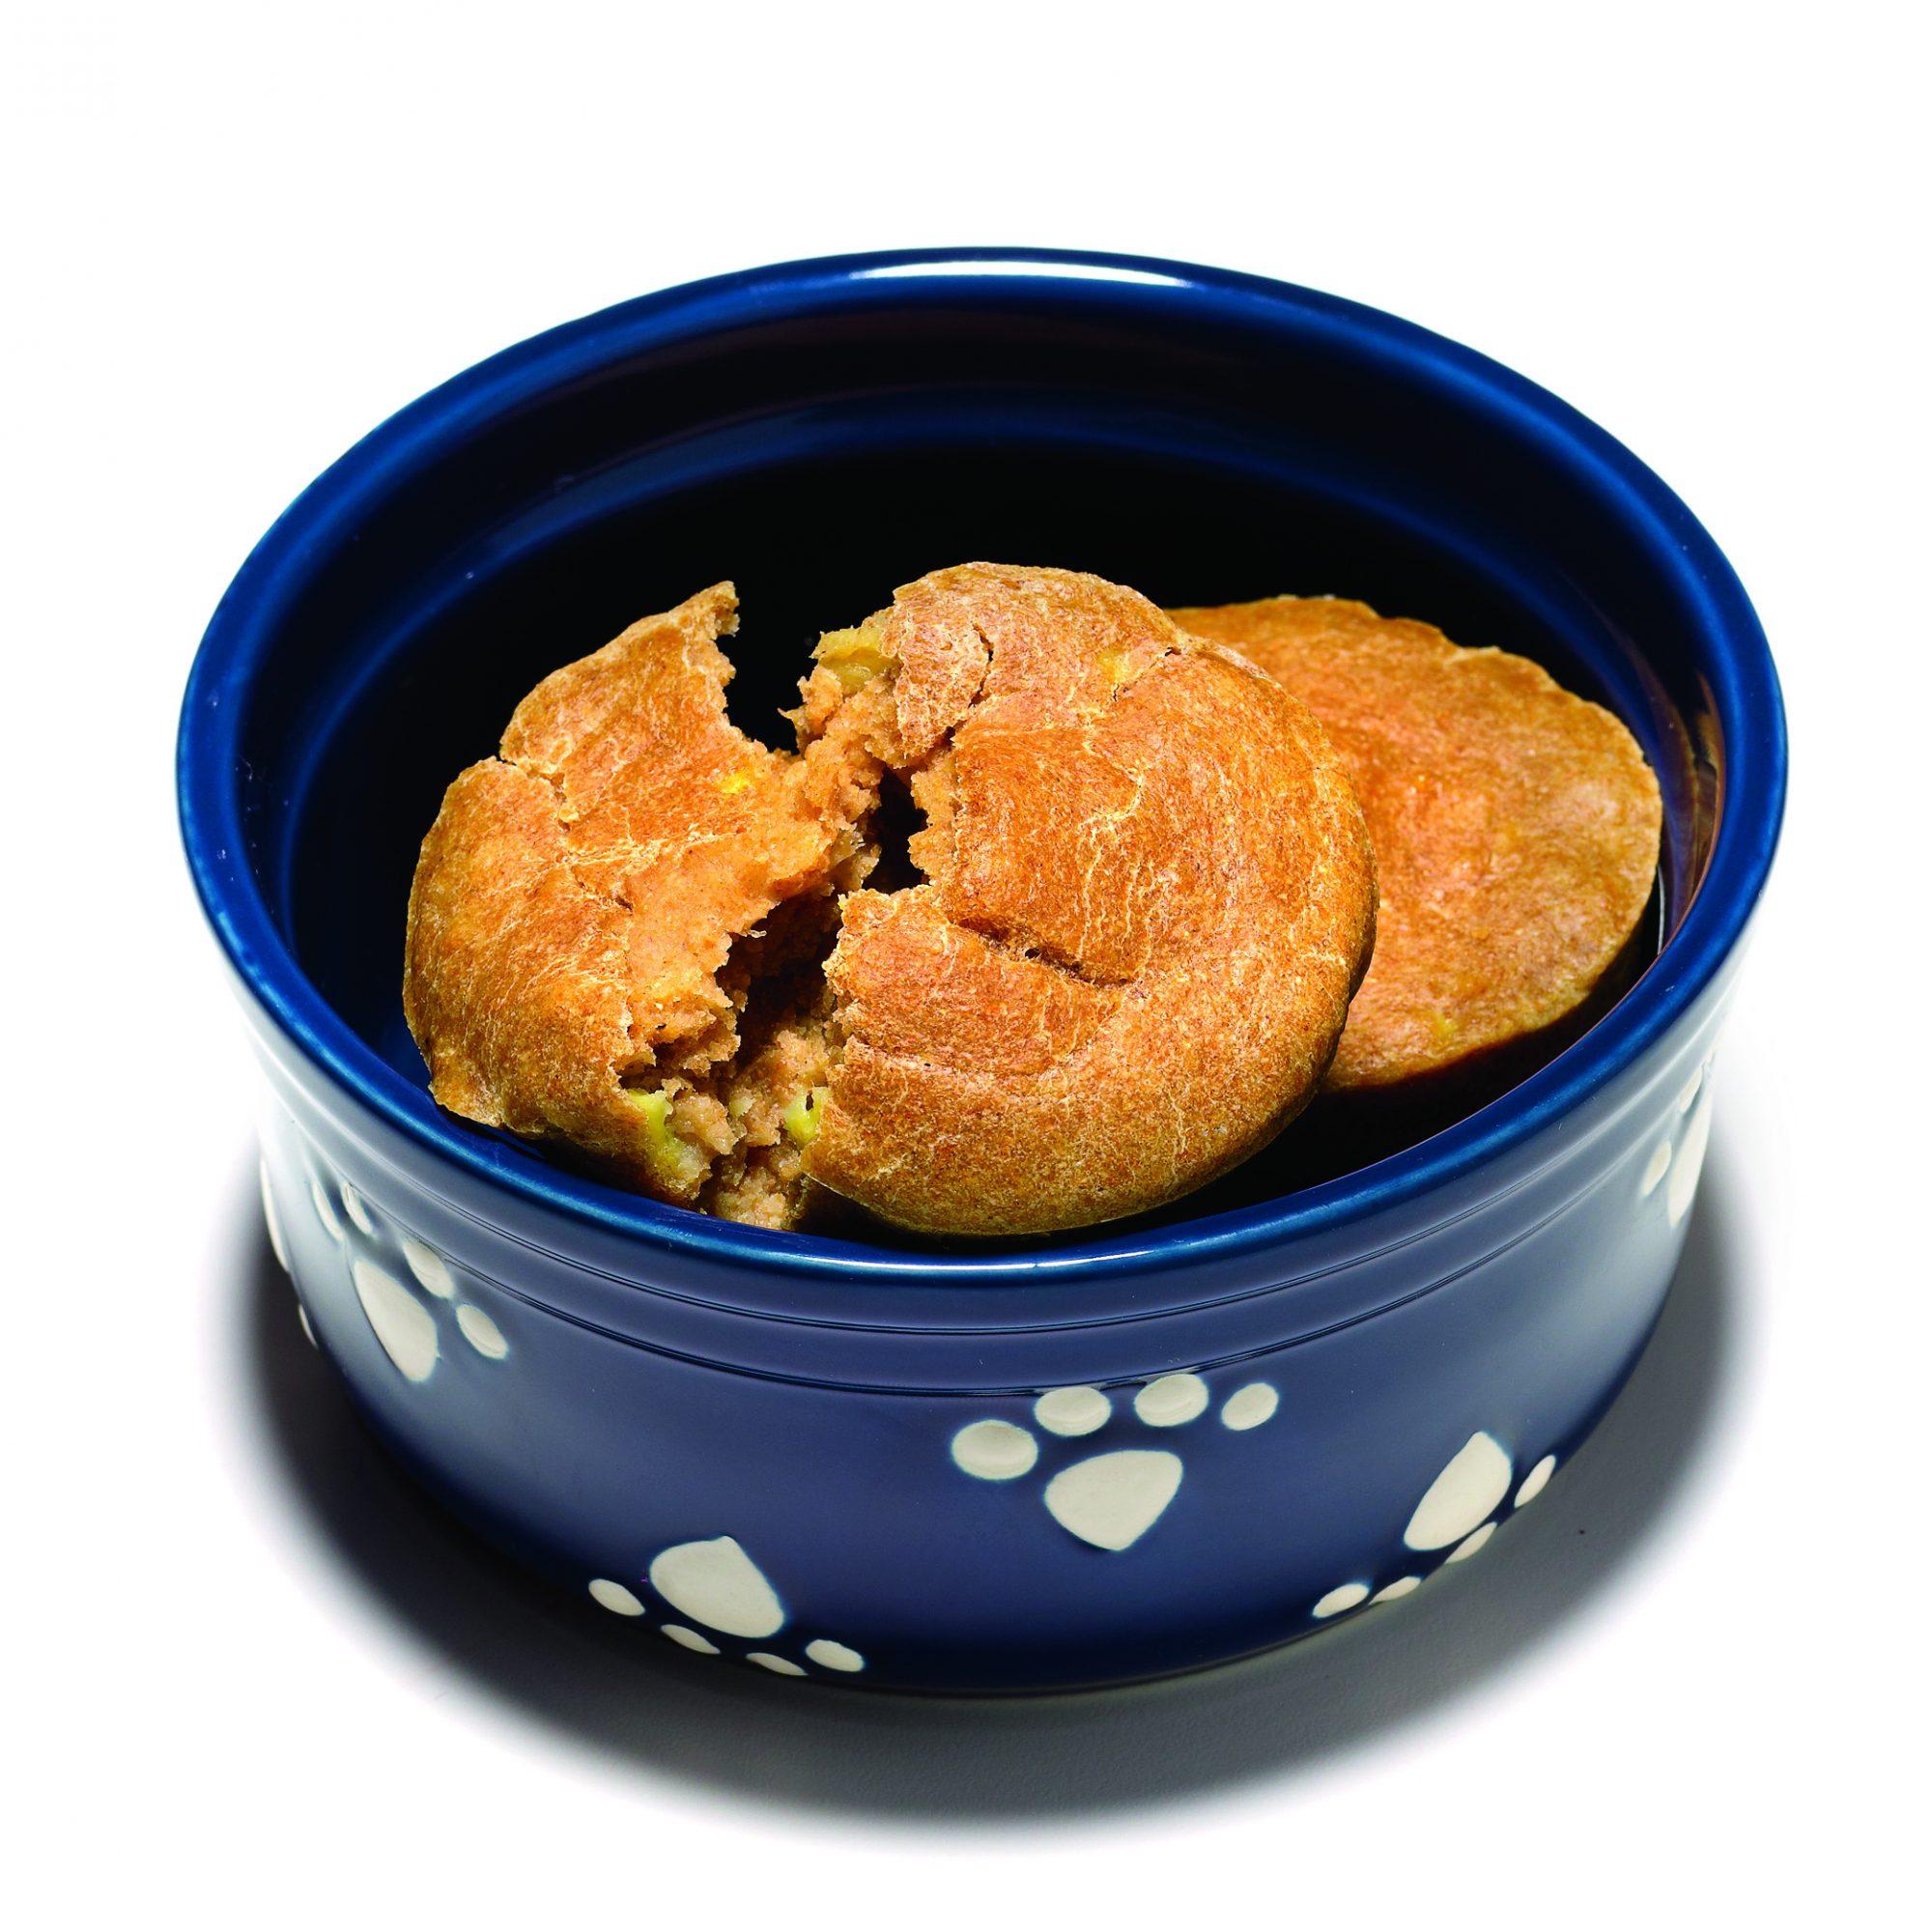 Springtime Muffins